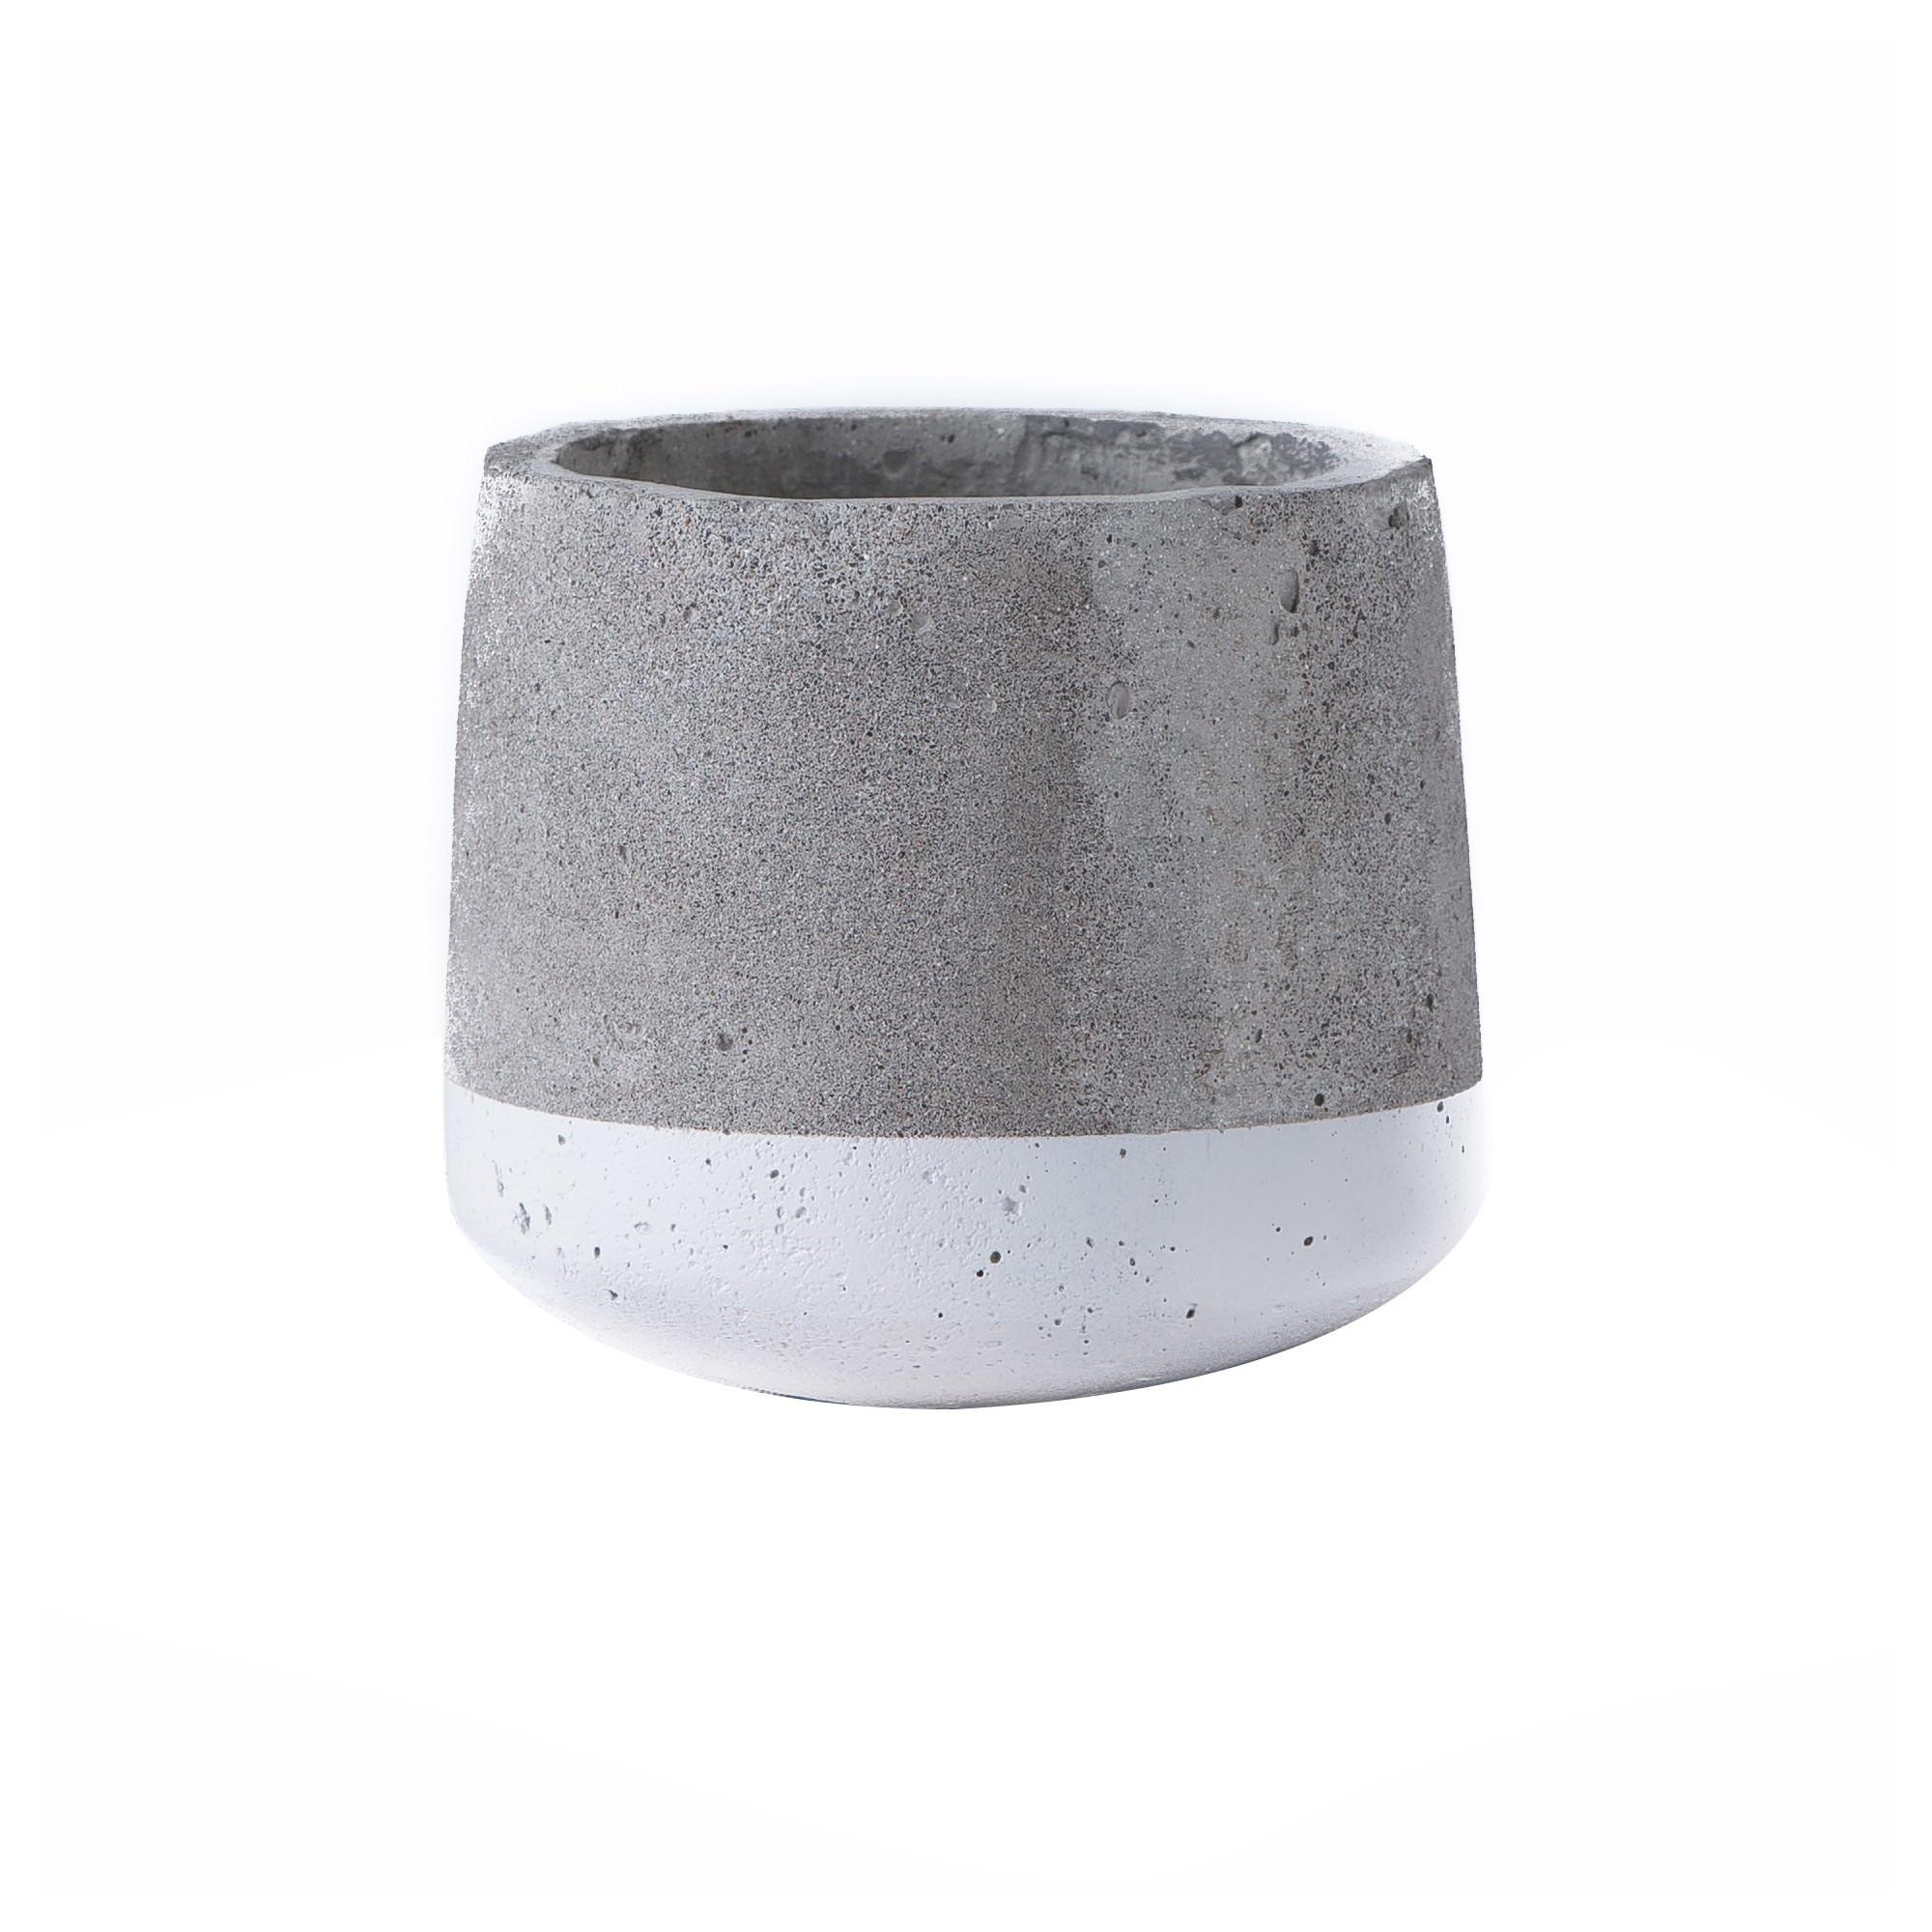 Alanis Commercial Grade Concrete Pot Planter, Small, Grey / White